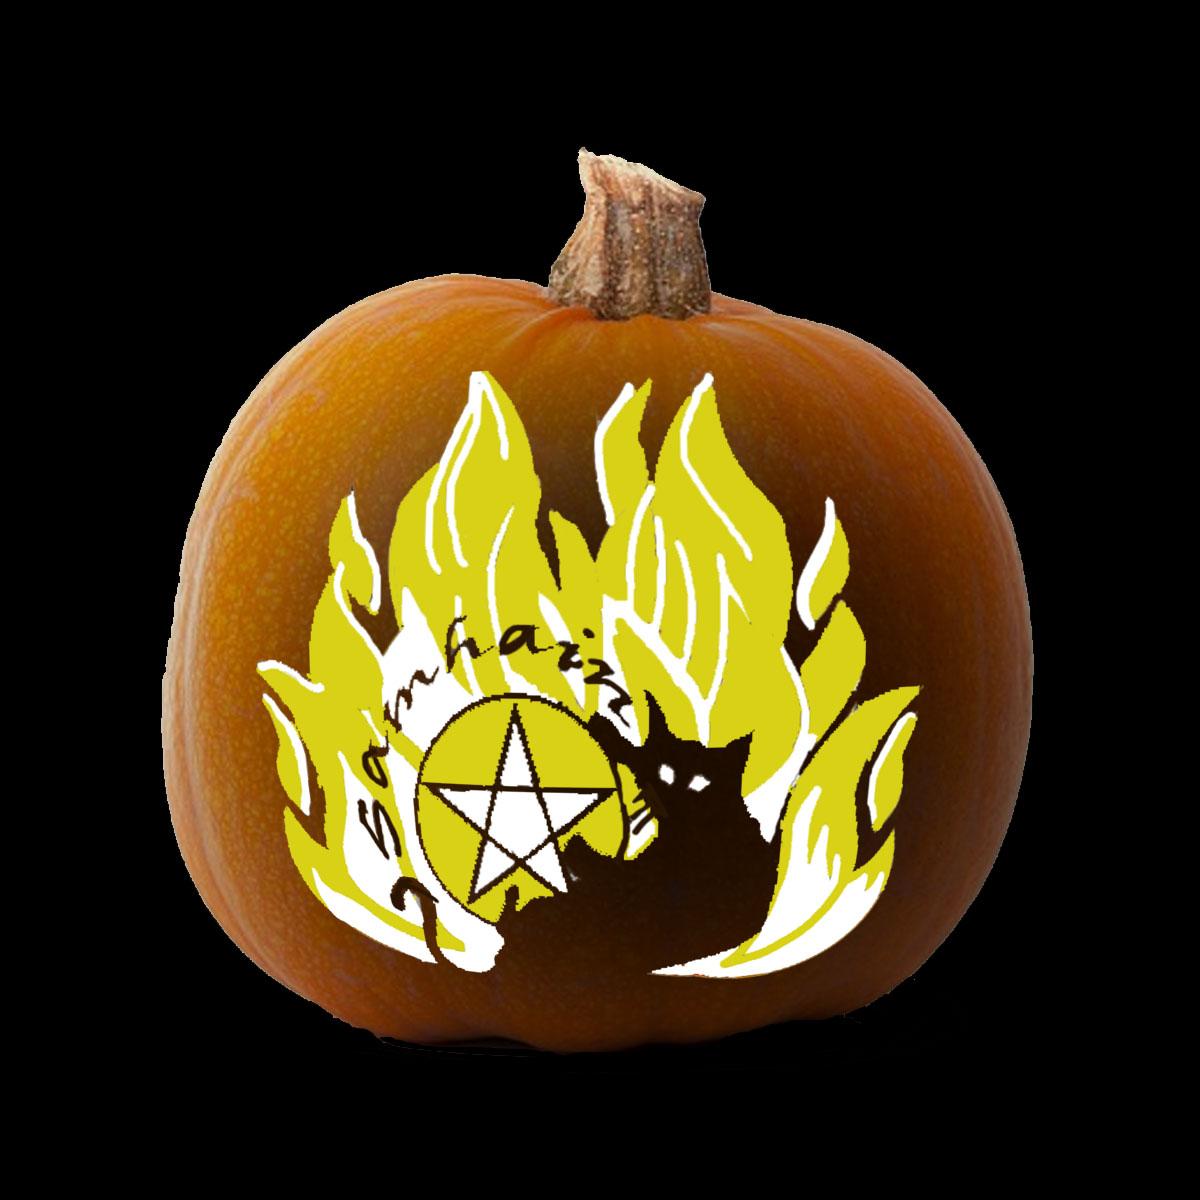 More Samhain Pagan Pumpkin Carving Printable Stencils